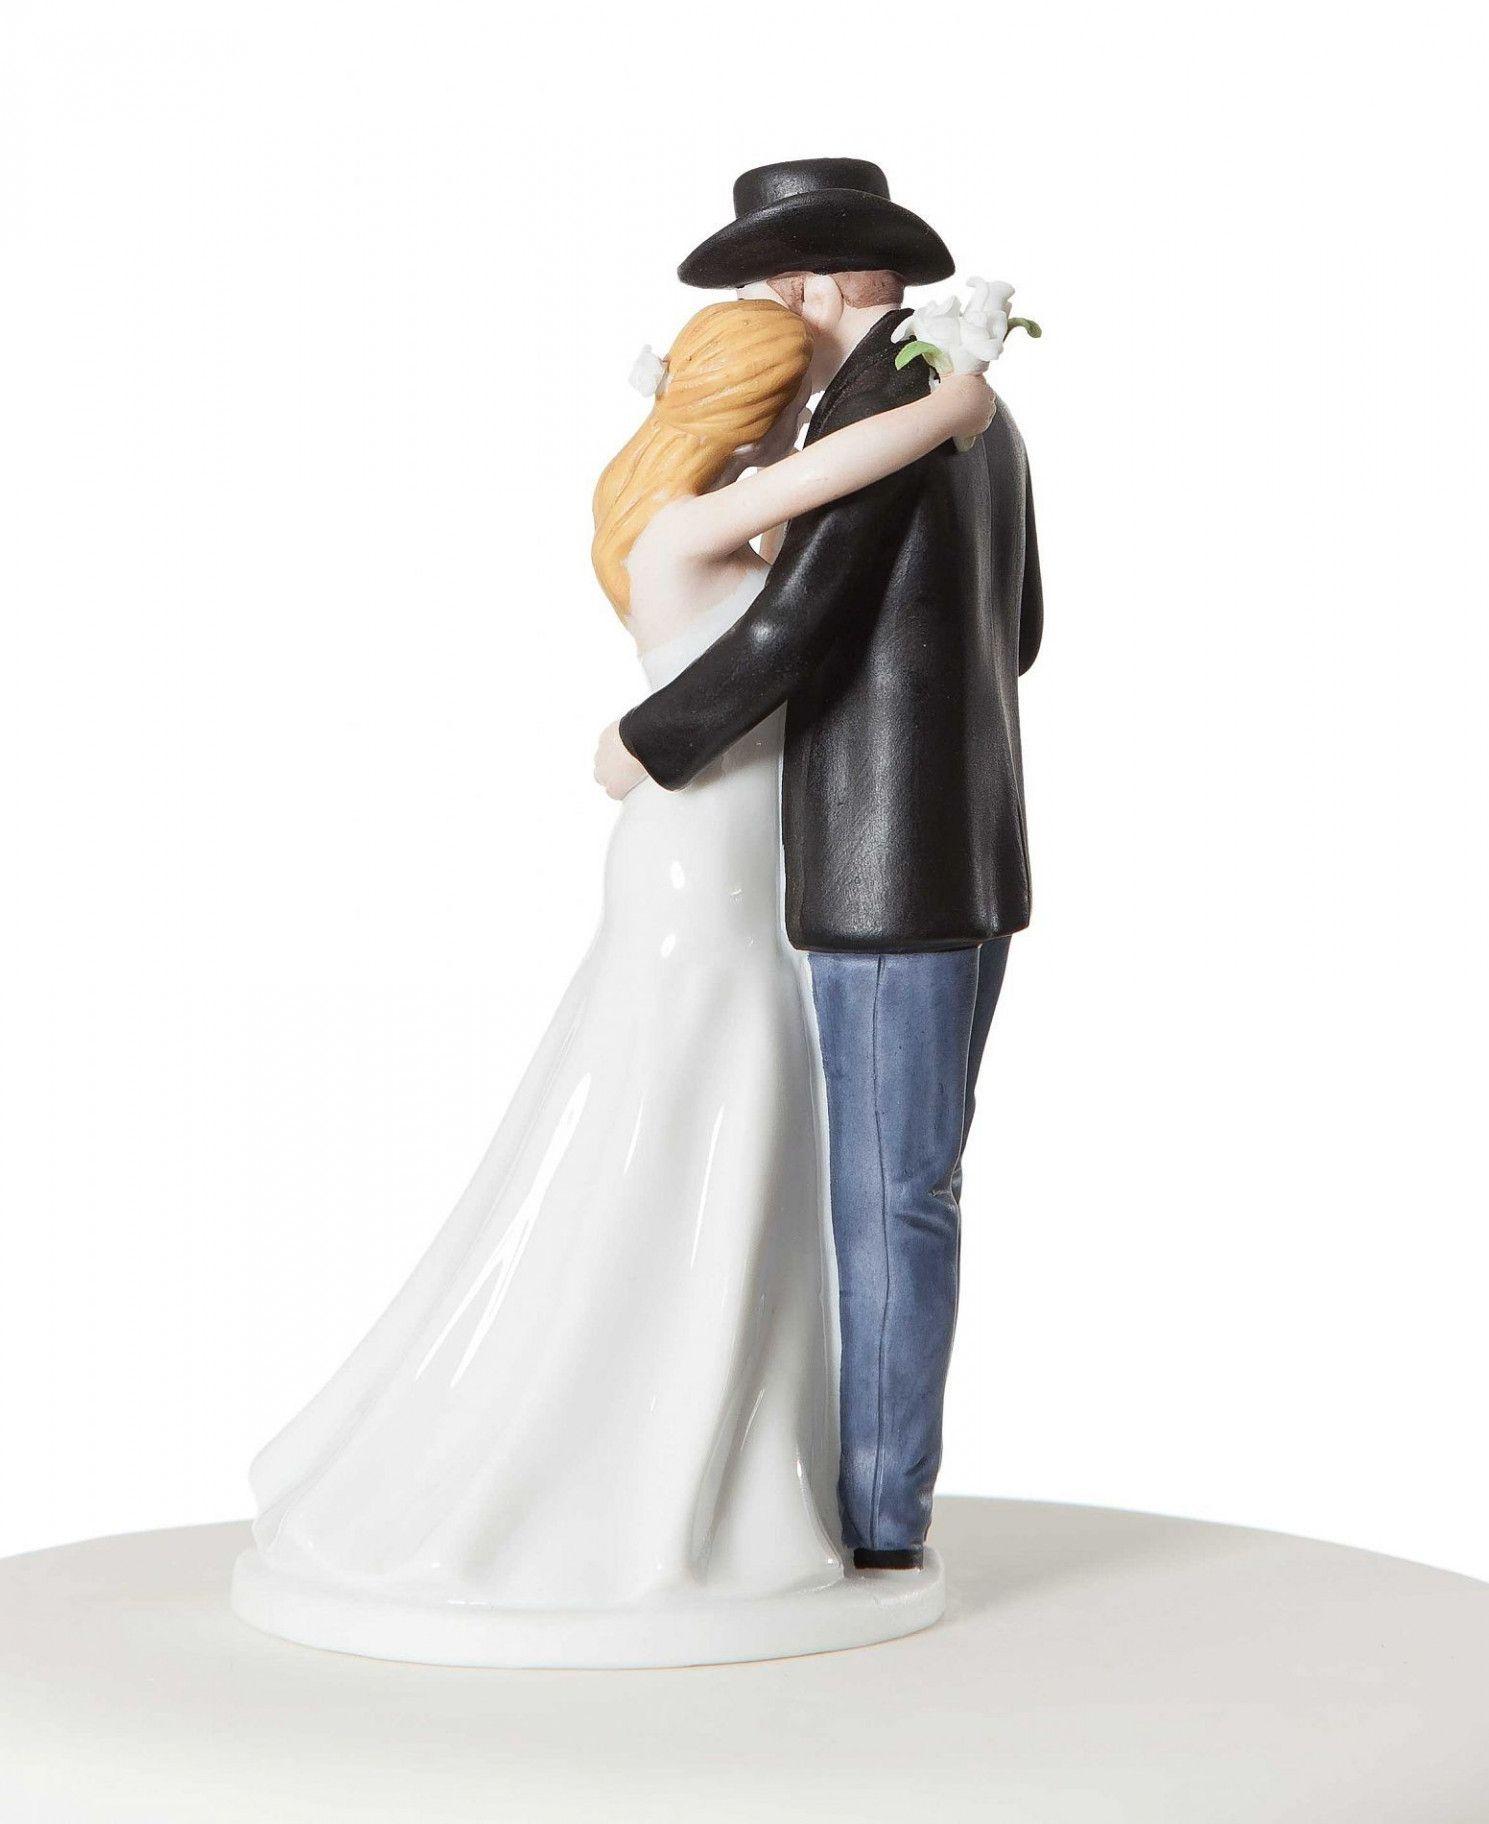 Ten Brilliant Ways To Advertise Western Wedding Cake Toppers Cheap Western Wedding Cakes Western Cake Toppers Cowboy Wedding Cakes